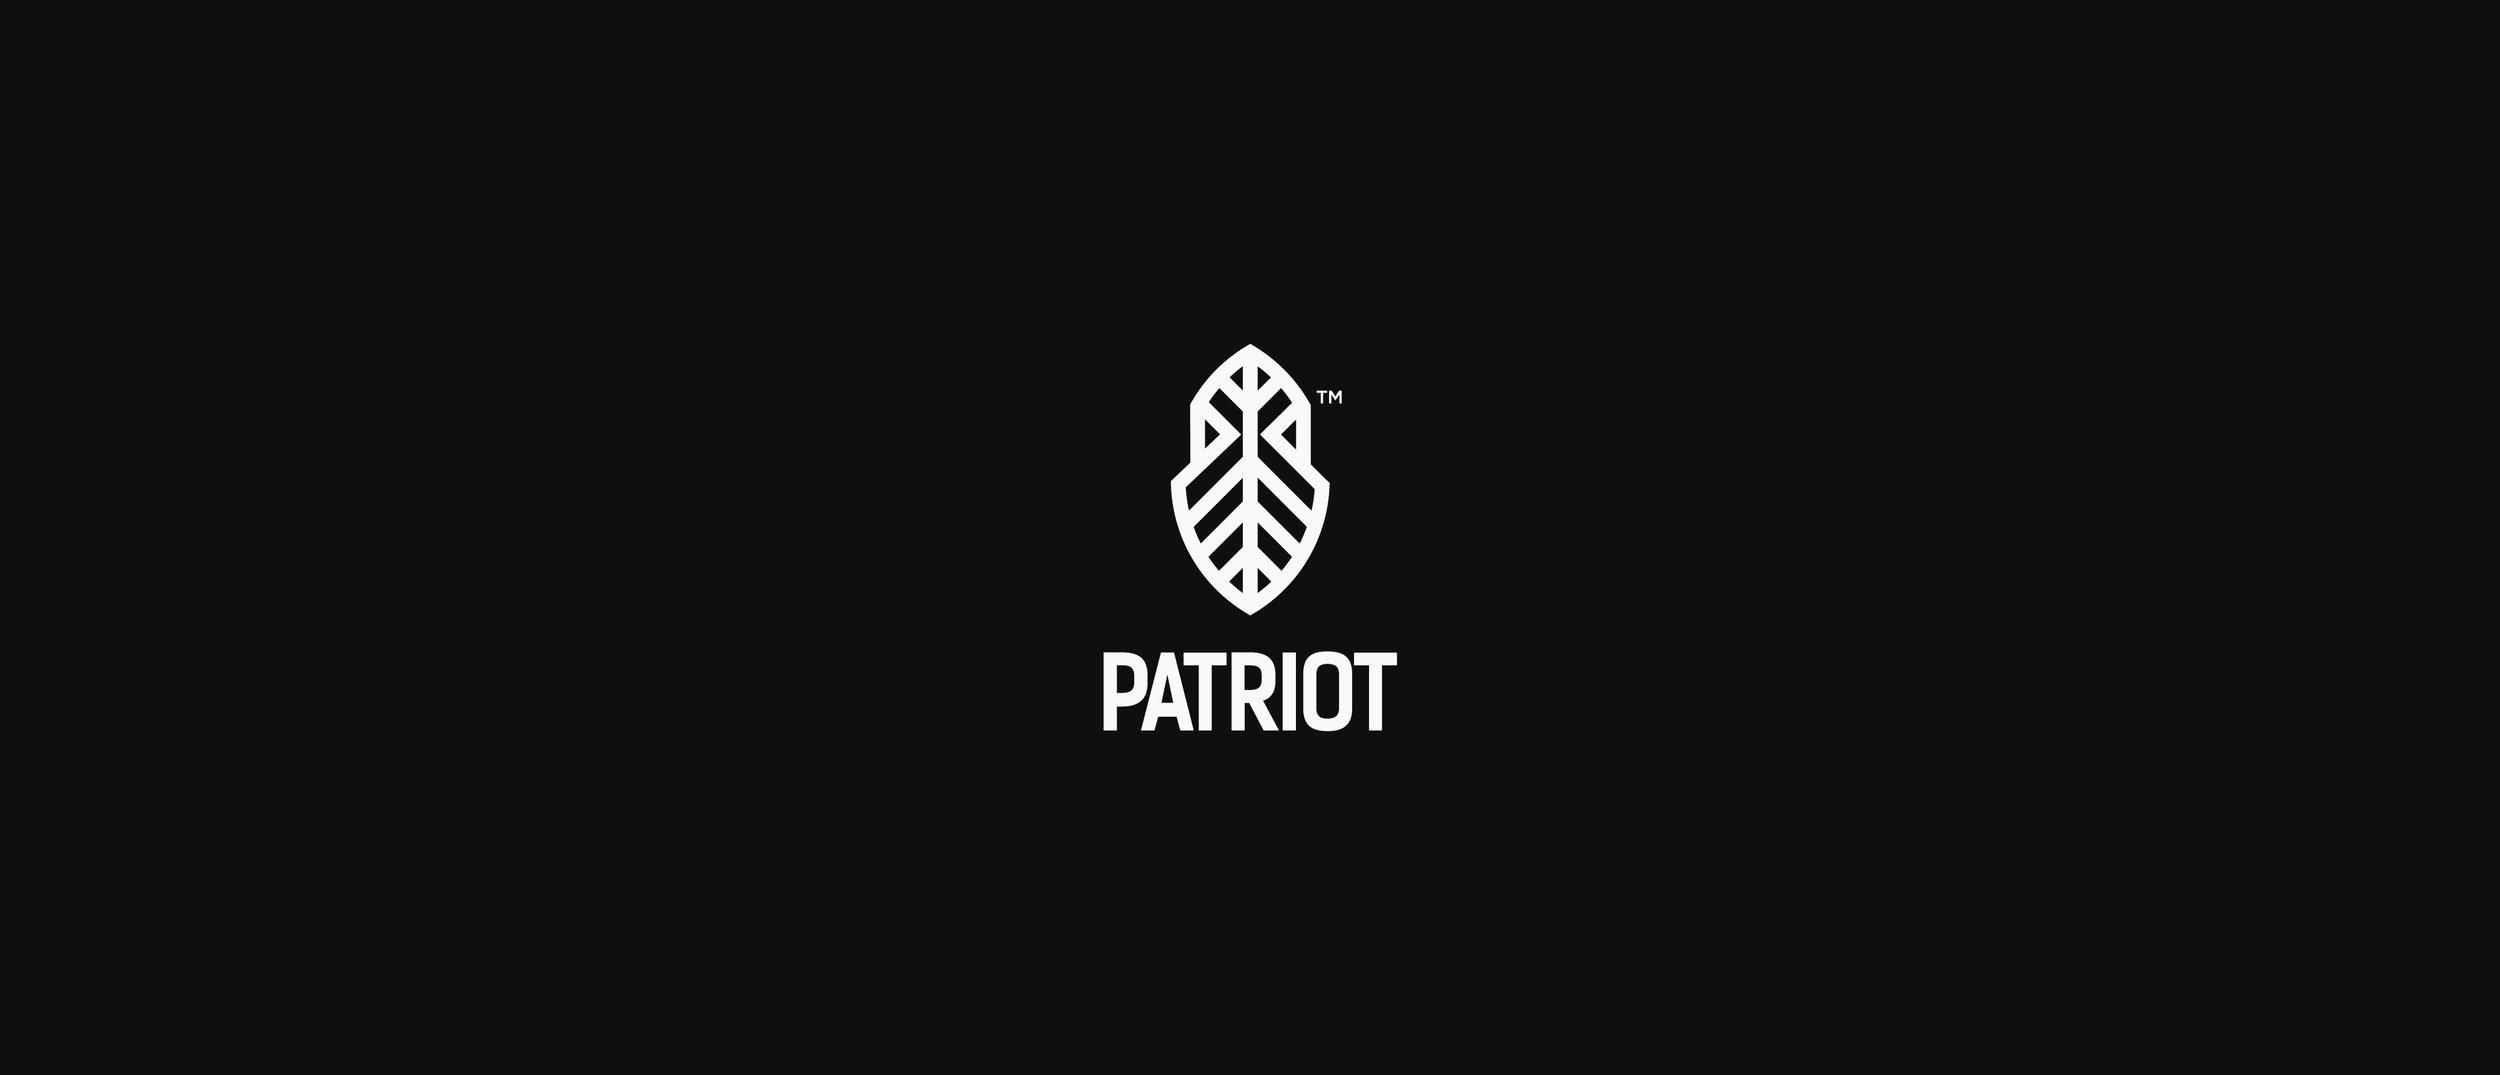 Patriot Watches | Wristwatch Company | 2017